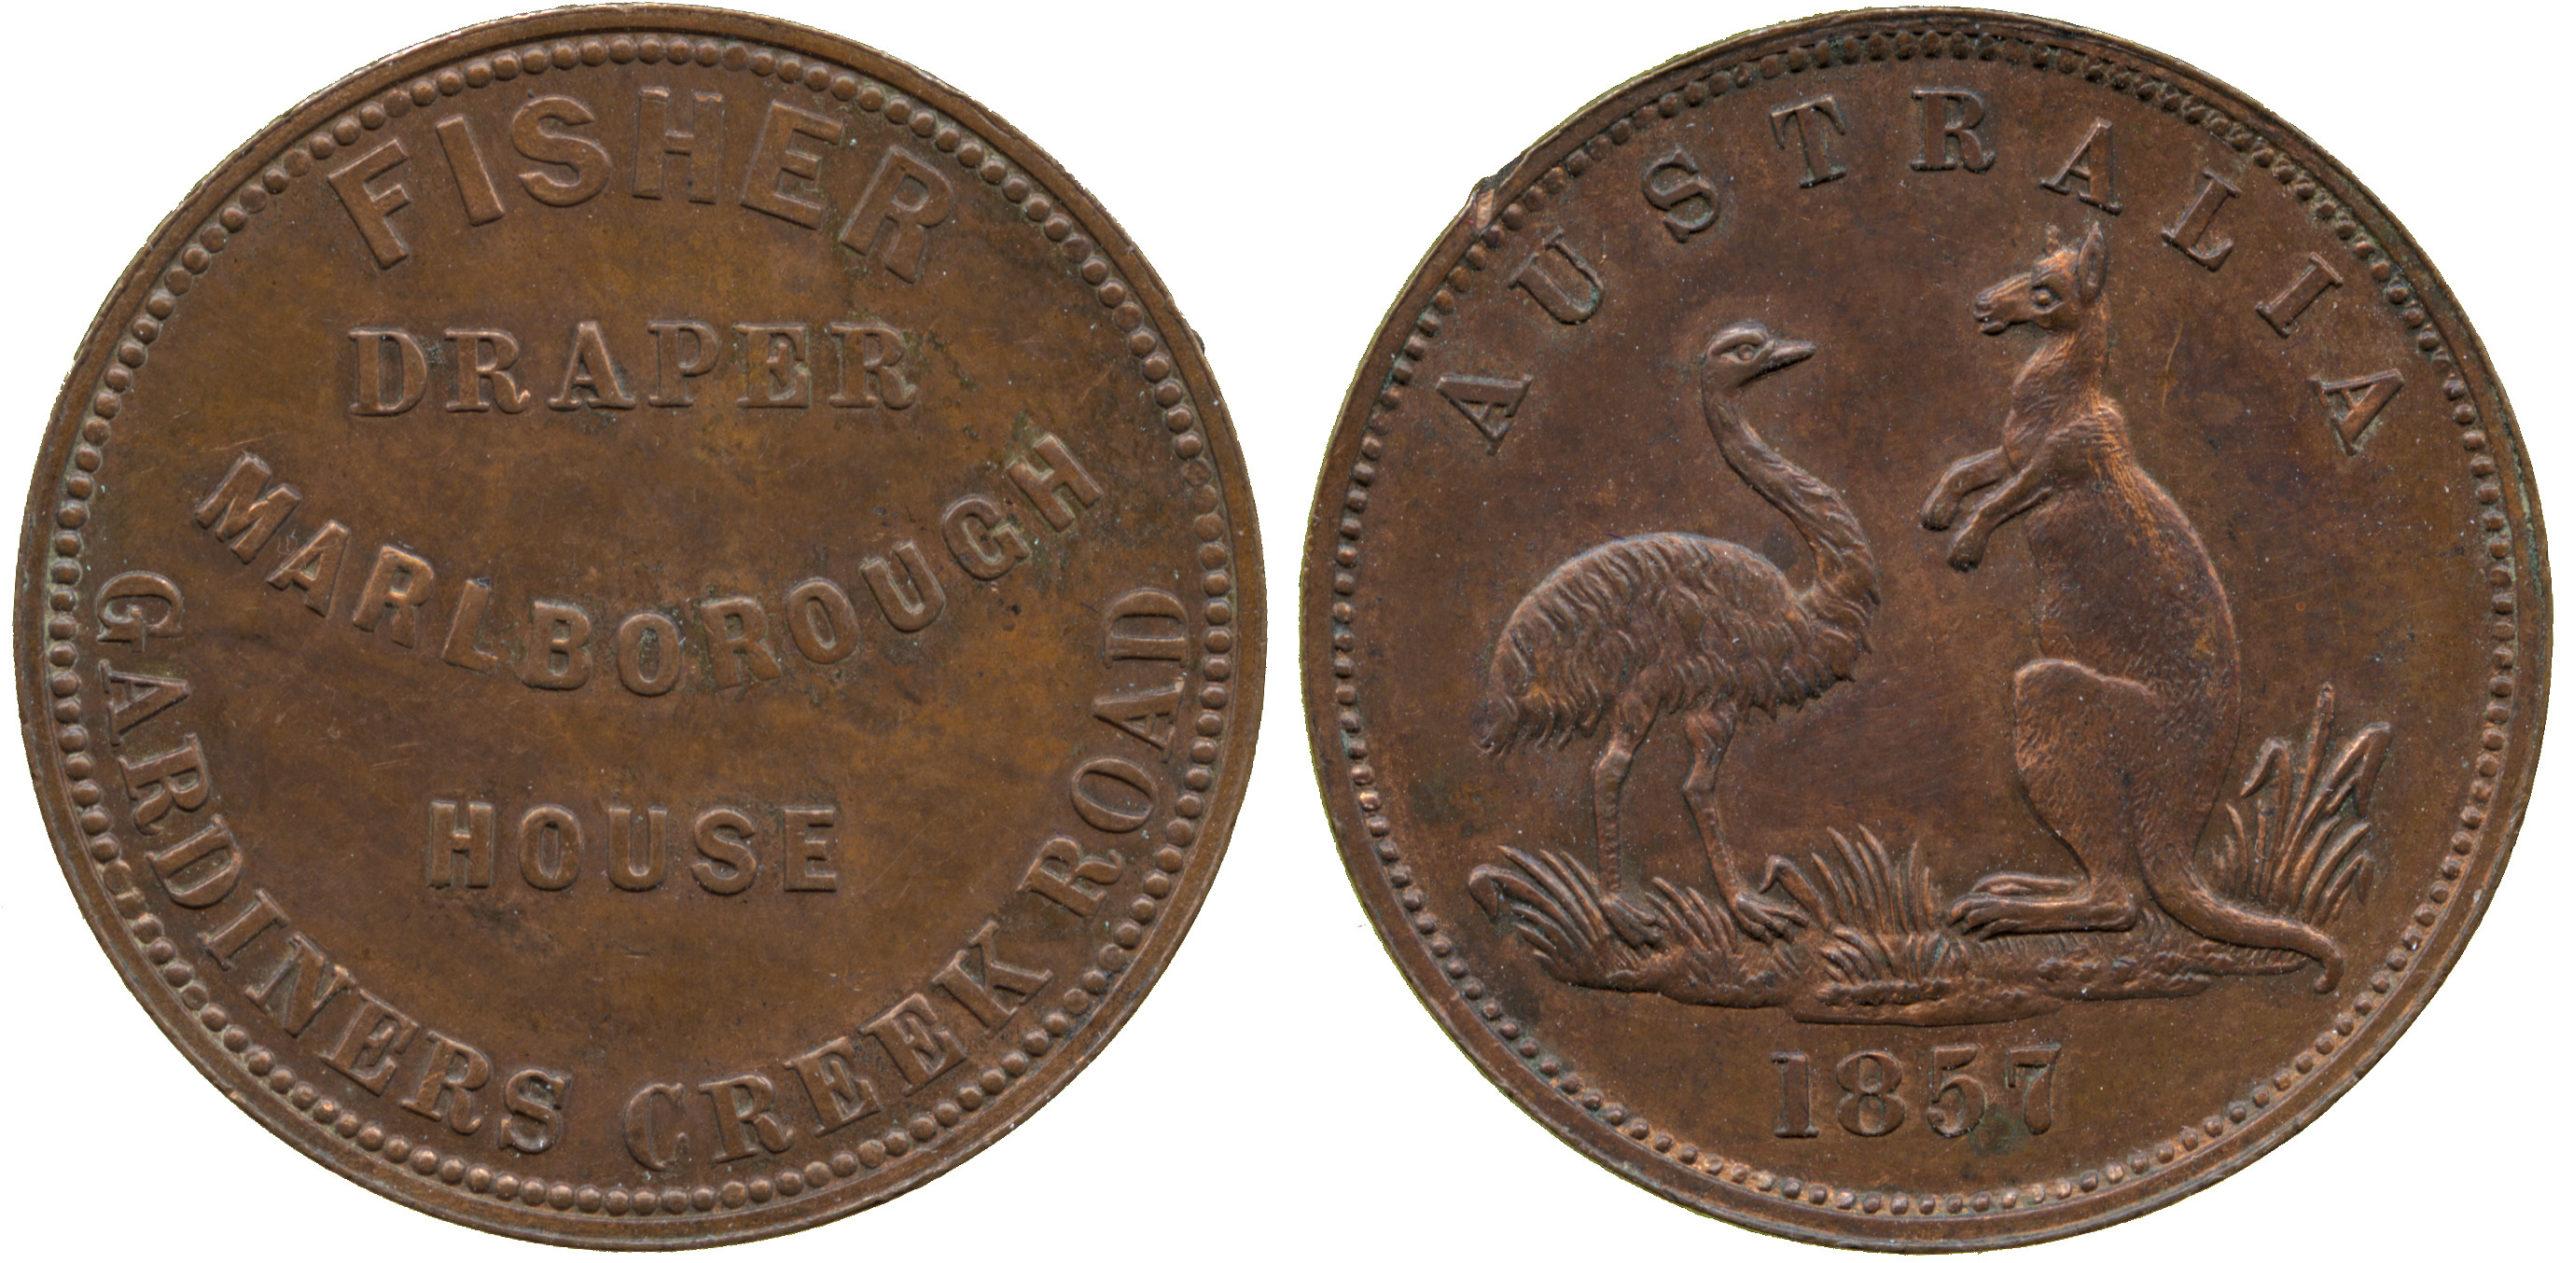 Australia, Victoria, Advertising Token, 1857